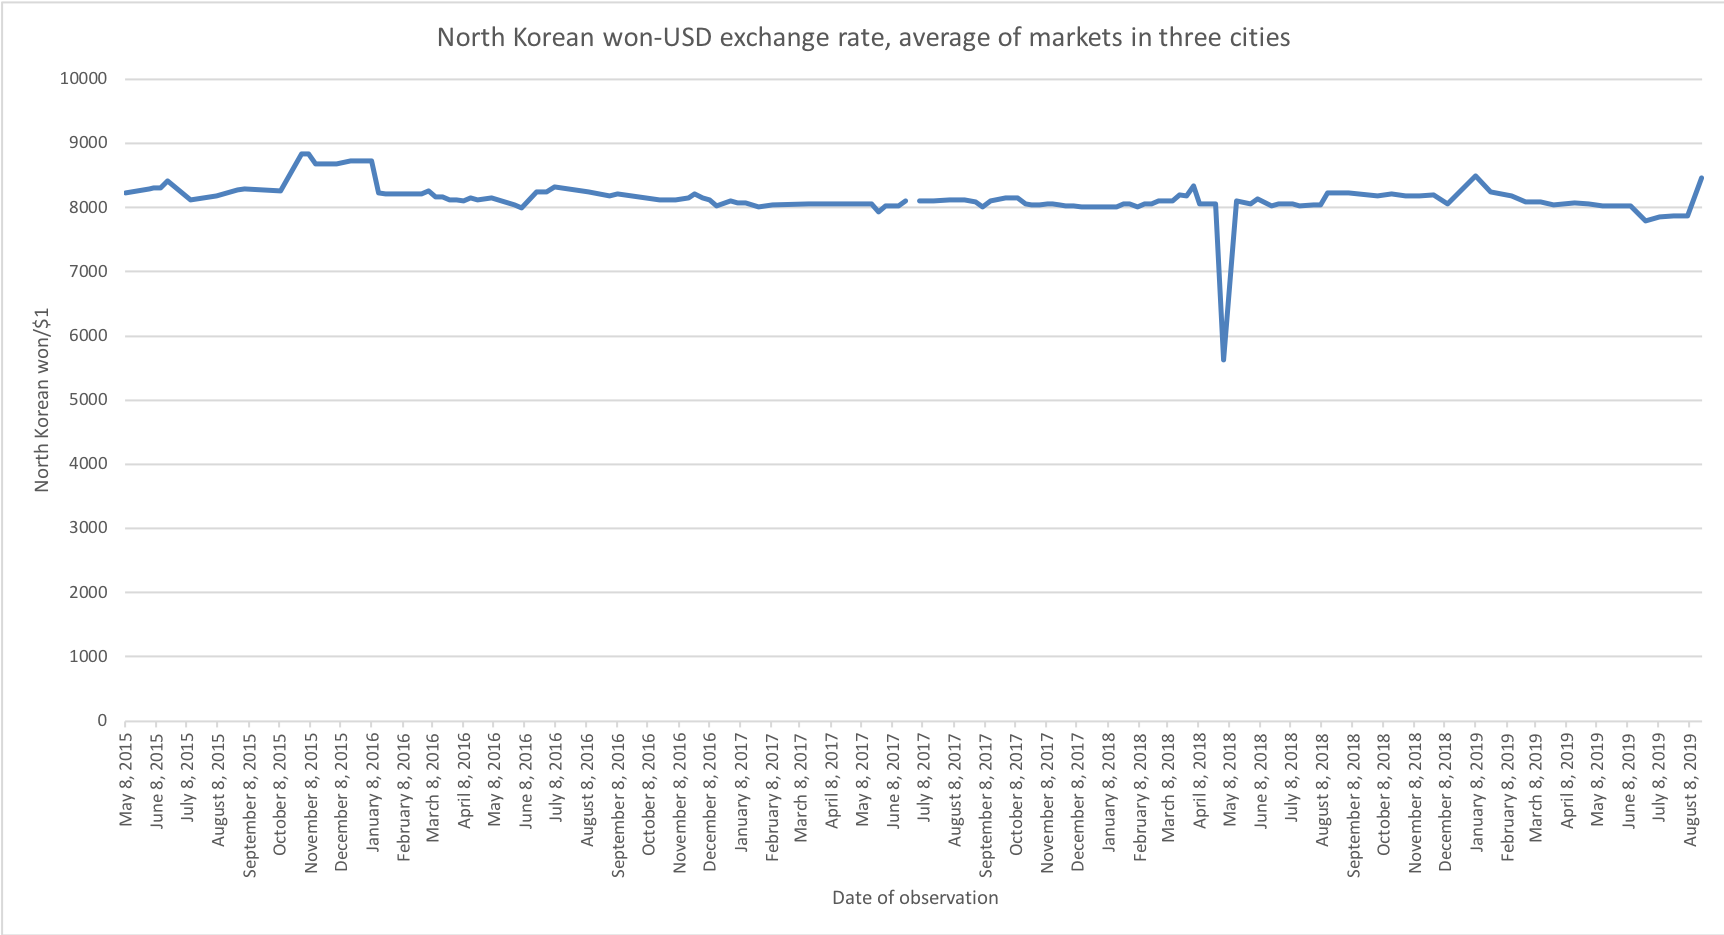 North Korean Economy Watch